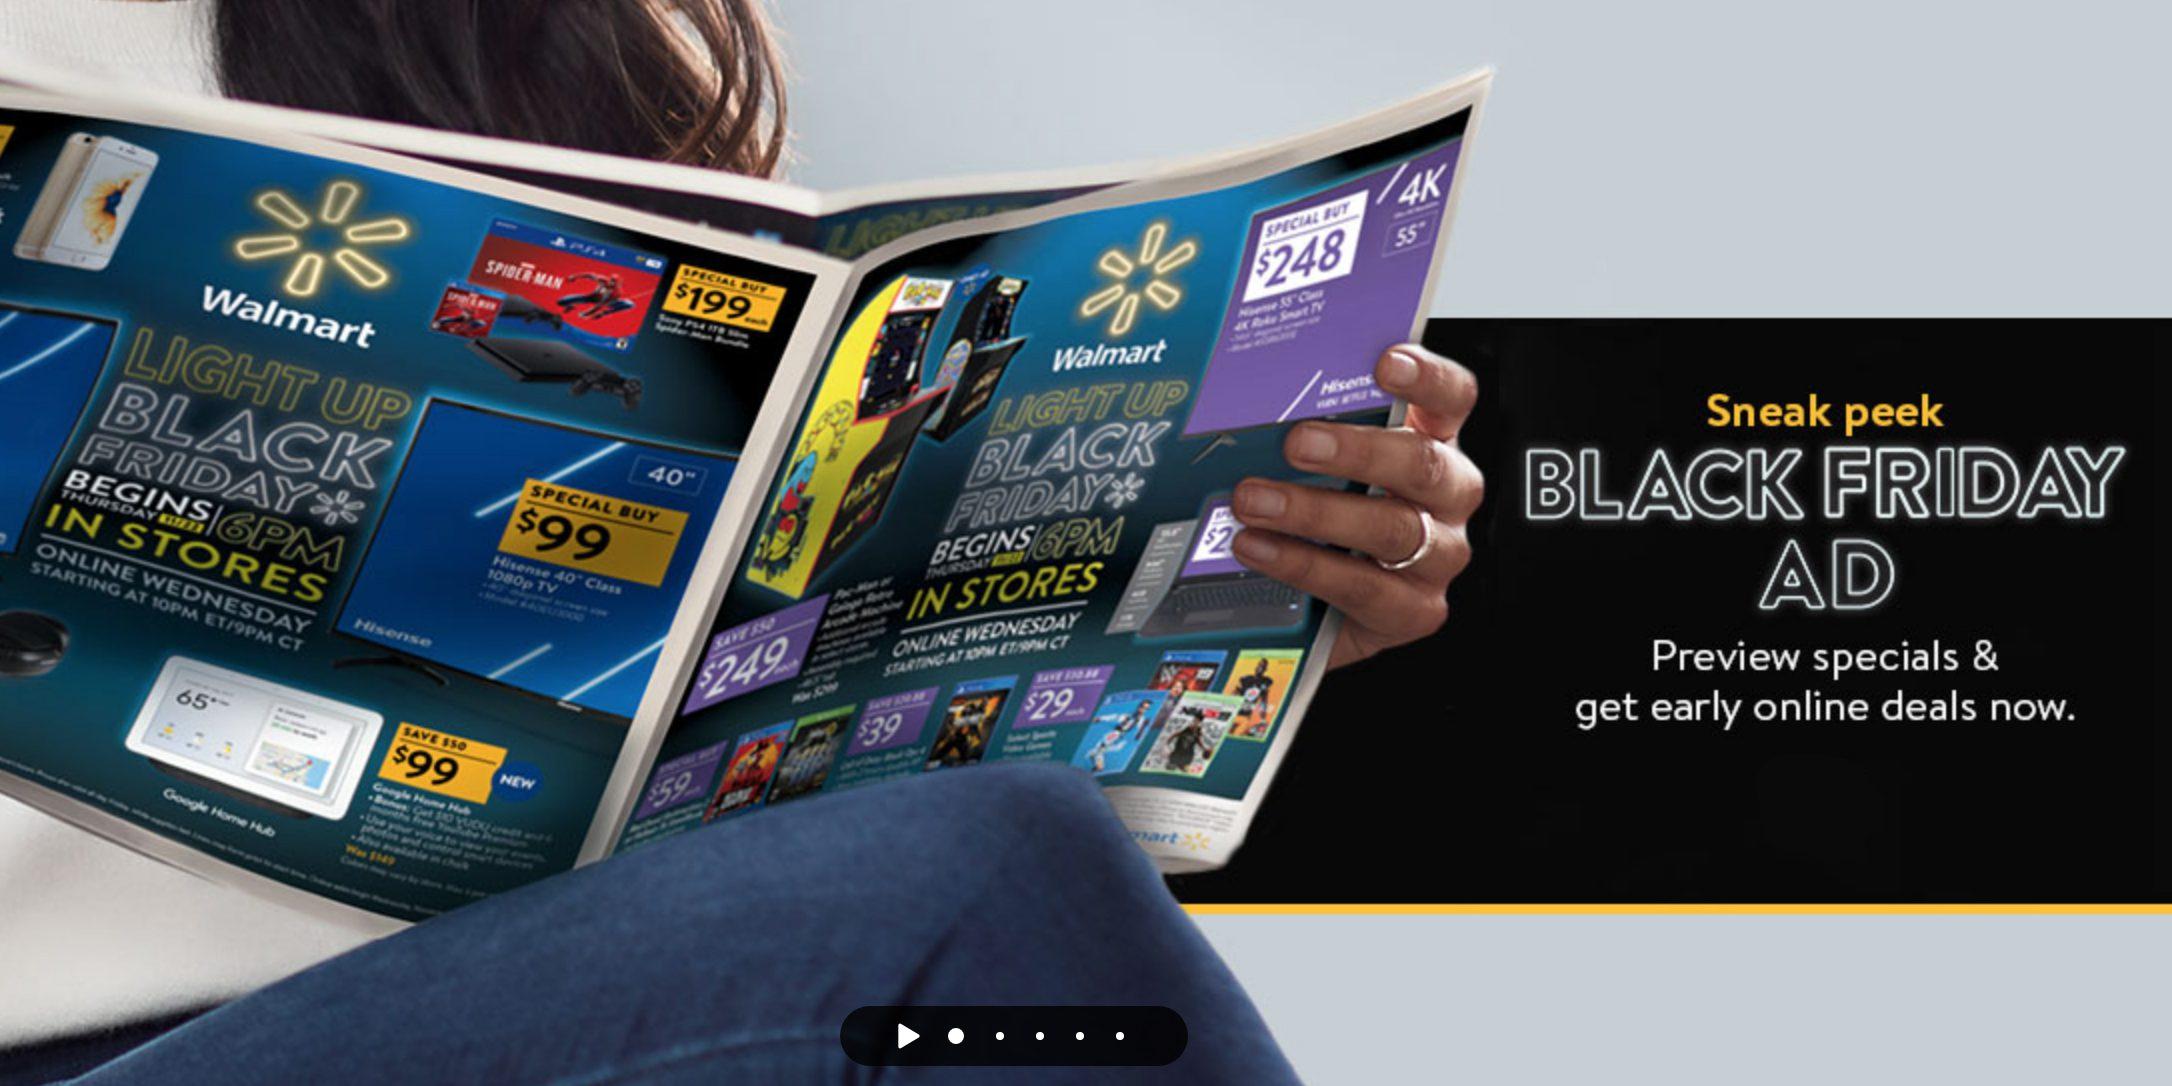 9to5Toys Letzter Anruf: Anker Pre-Black Friday Sale ab $ 12, Orbi 802.11ac Mesh-WLAN-System $ 245, ecobe3 Lite + Echo Dot $ 139, mehr